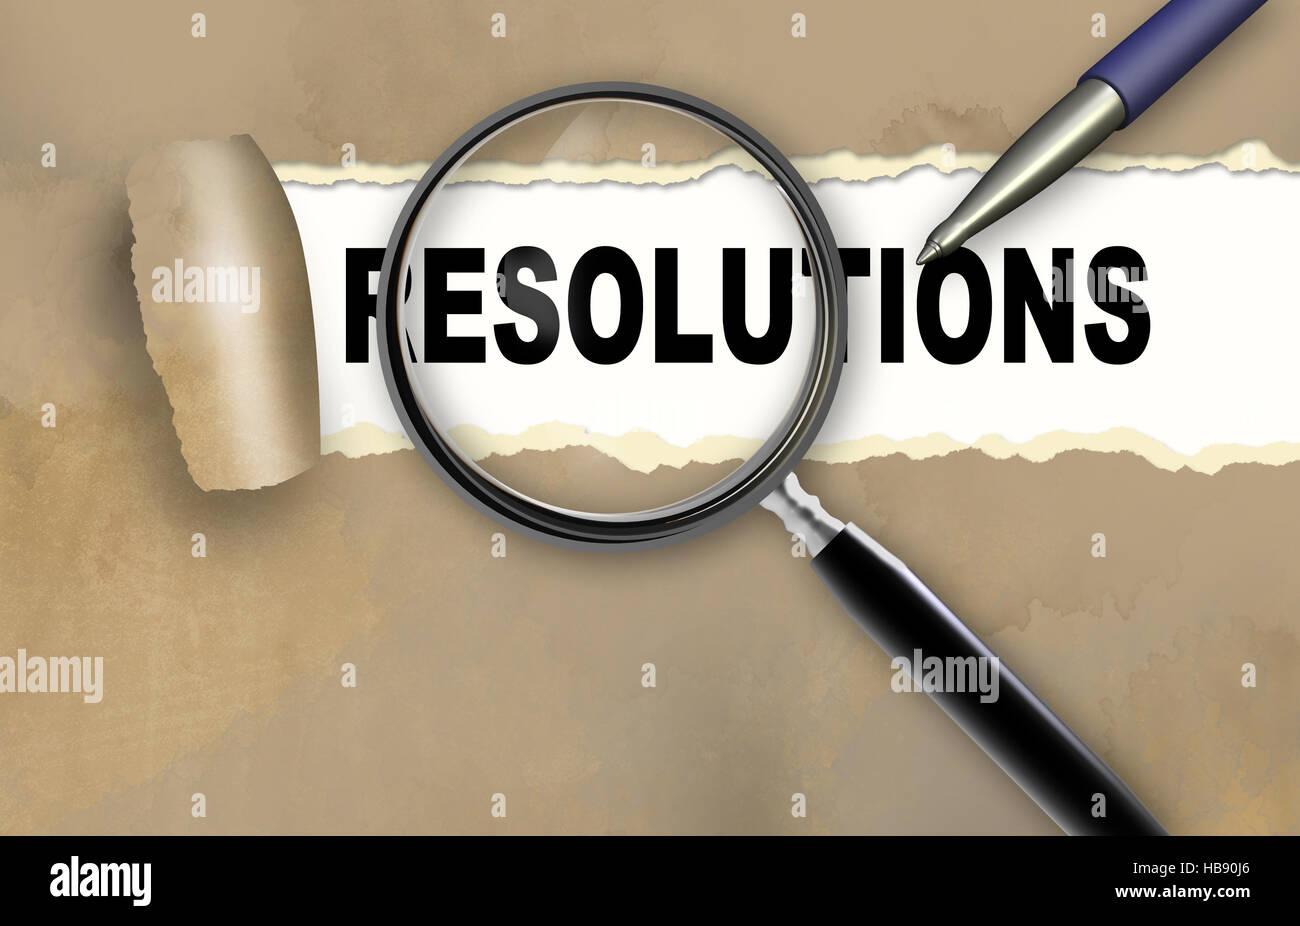 resolution - Stock Image